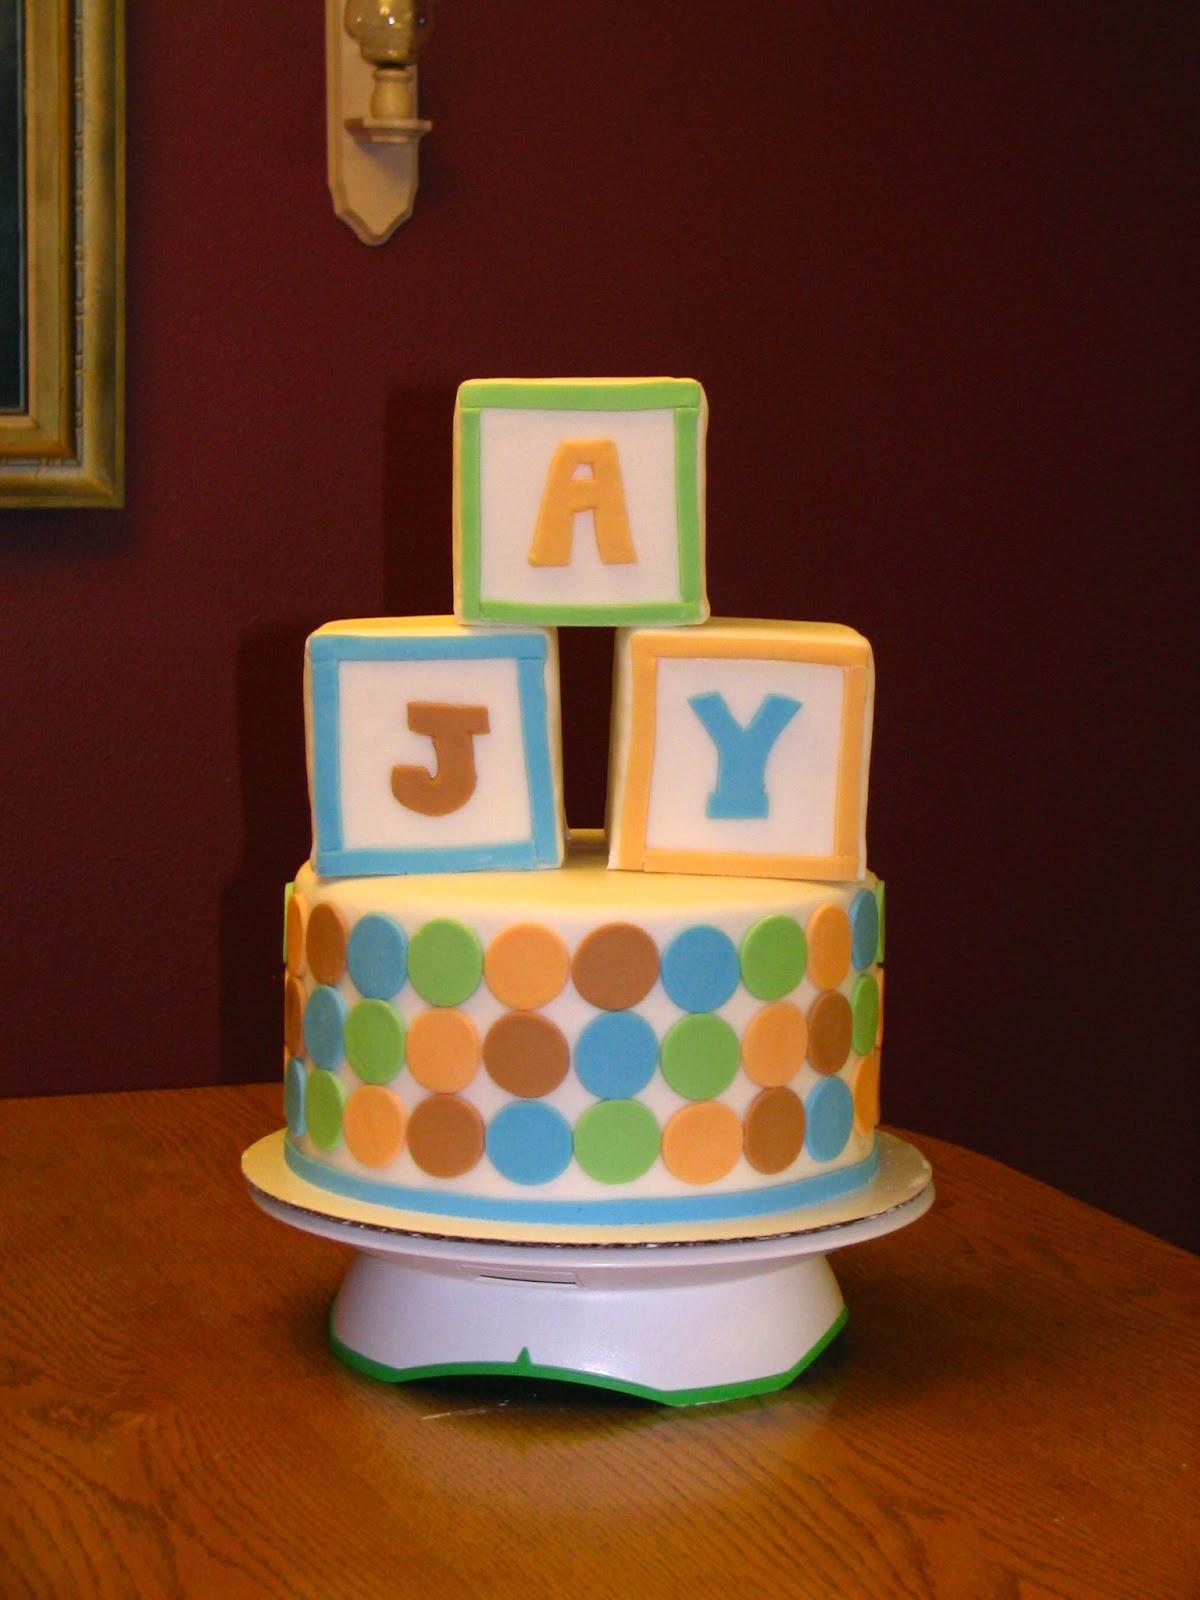 Alphabet Blocks Cake Decoration Of My Cakes Creations And More Abc Block Cake